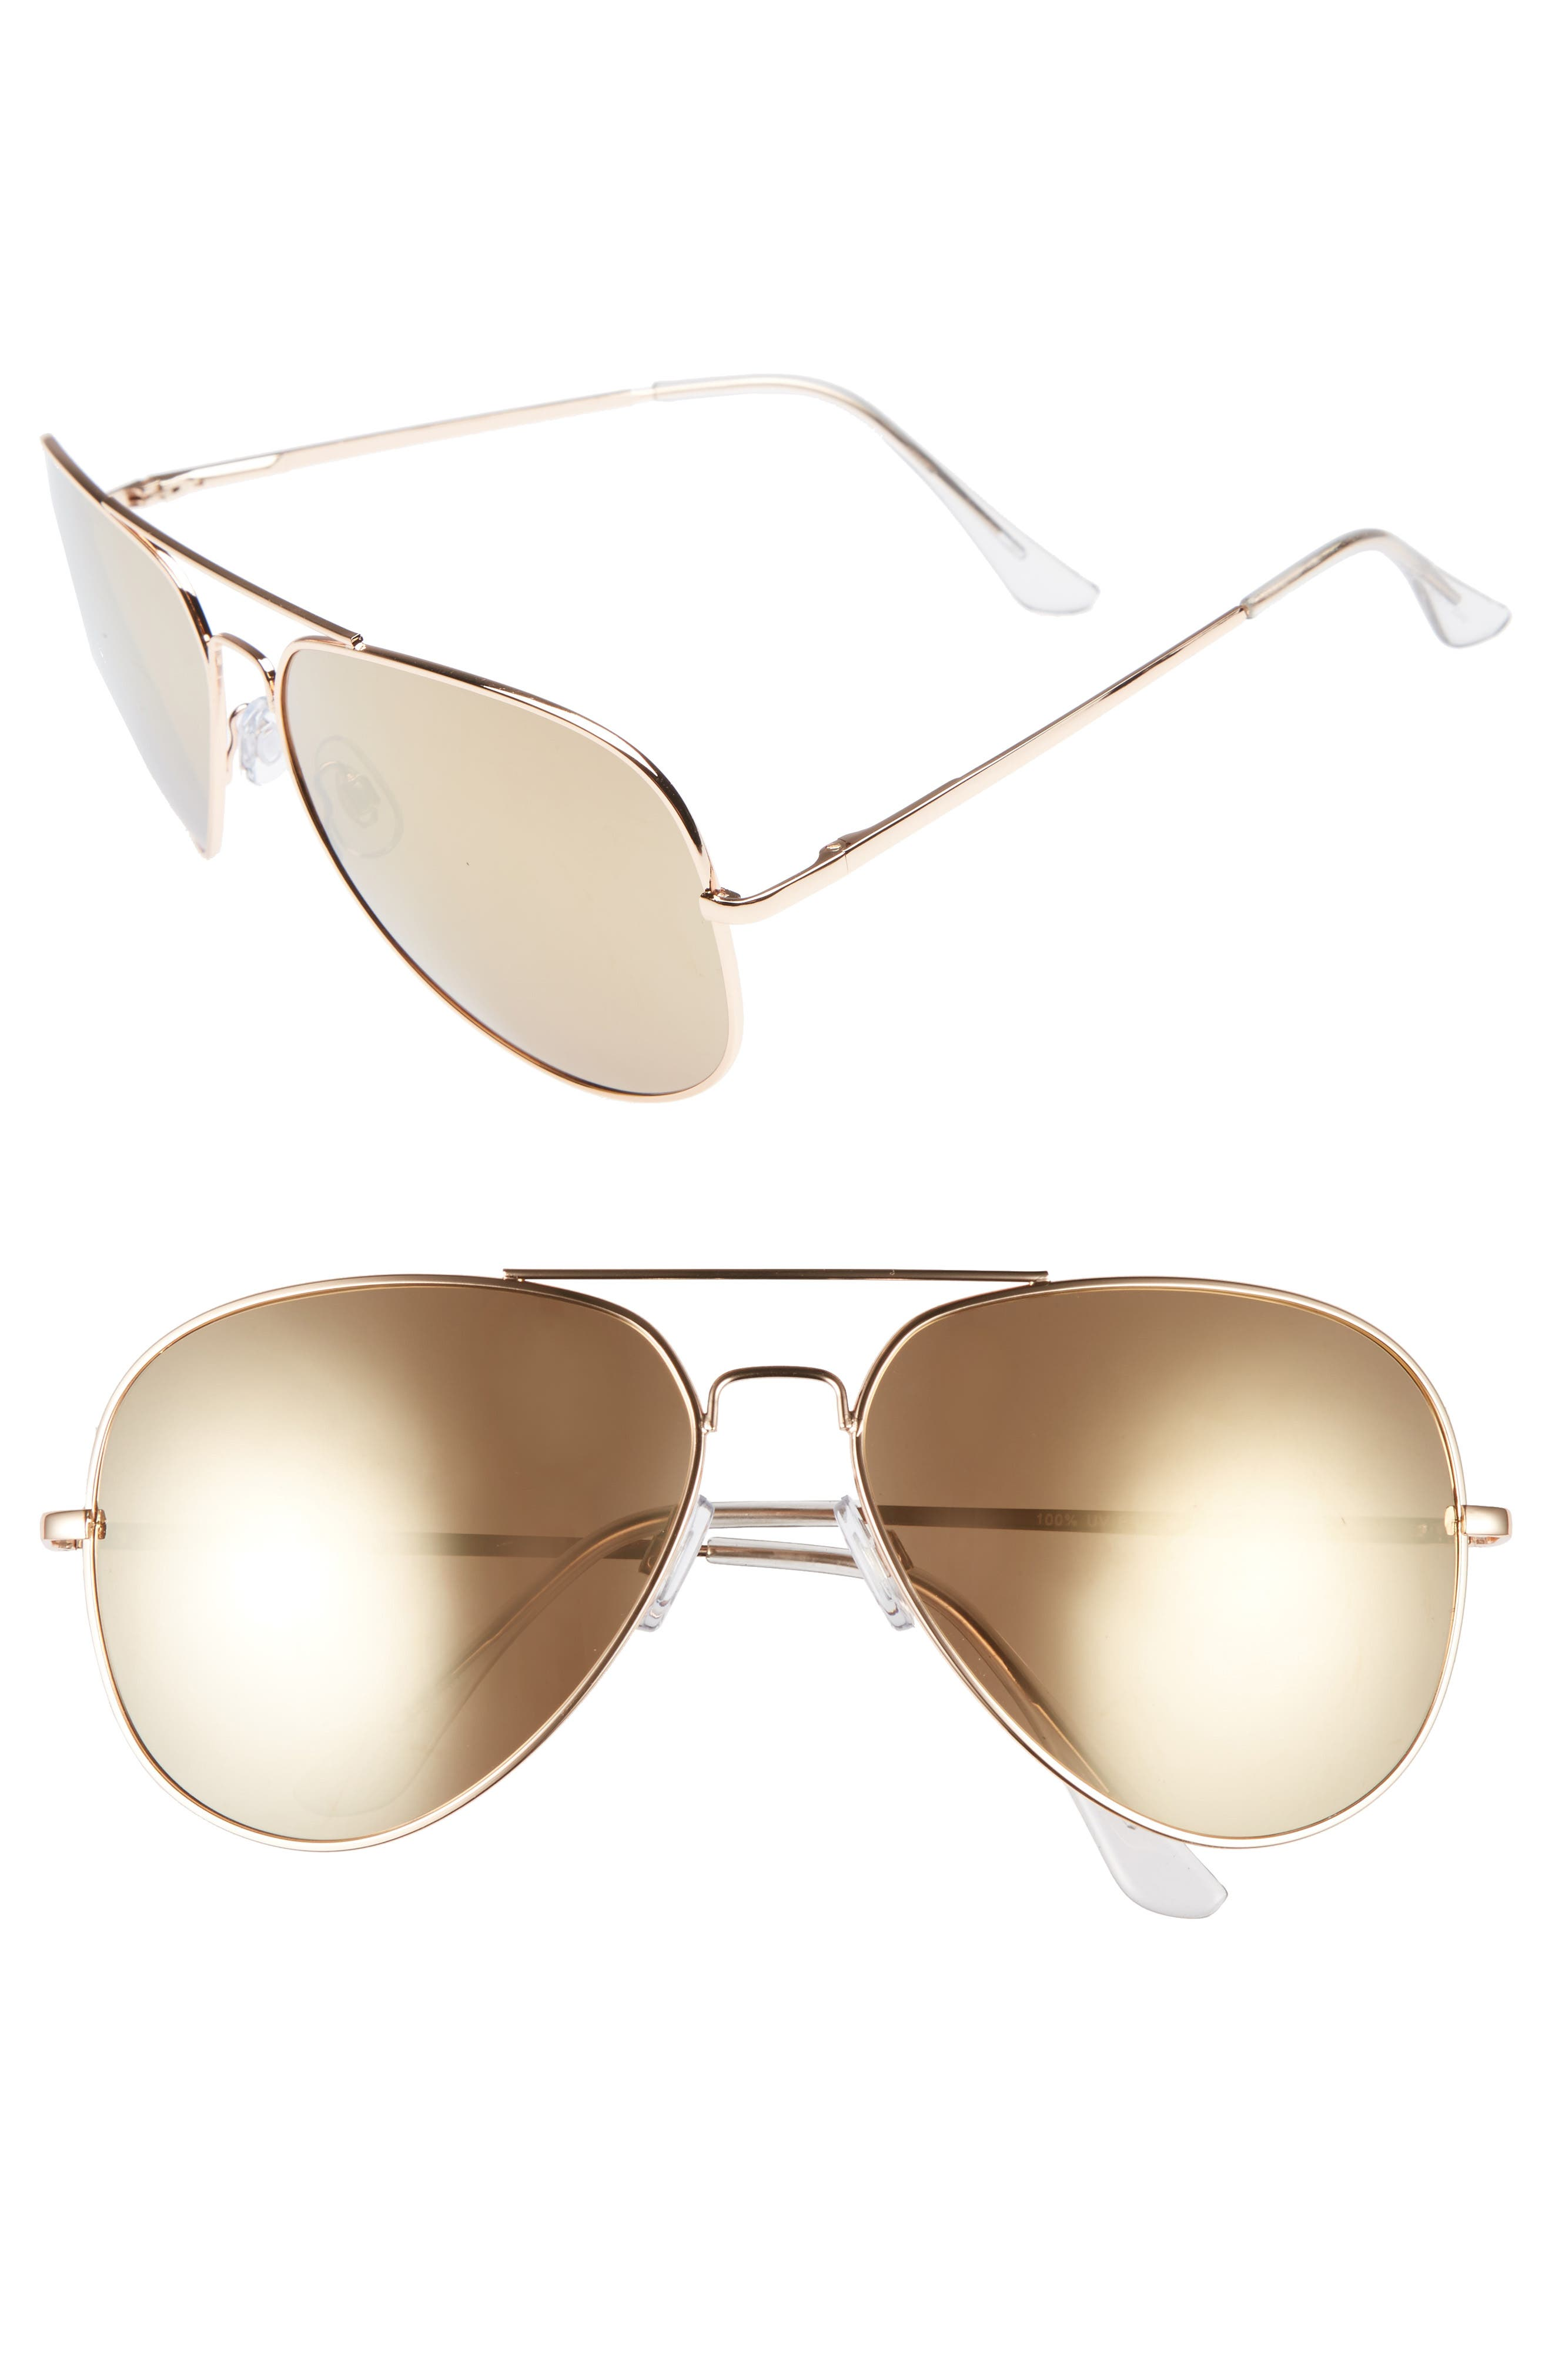 60mm Large Aviator Sunglasses,                             Main thumbnail 2, color,